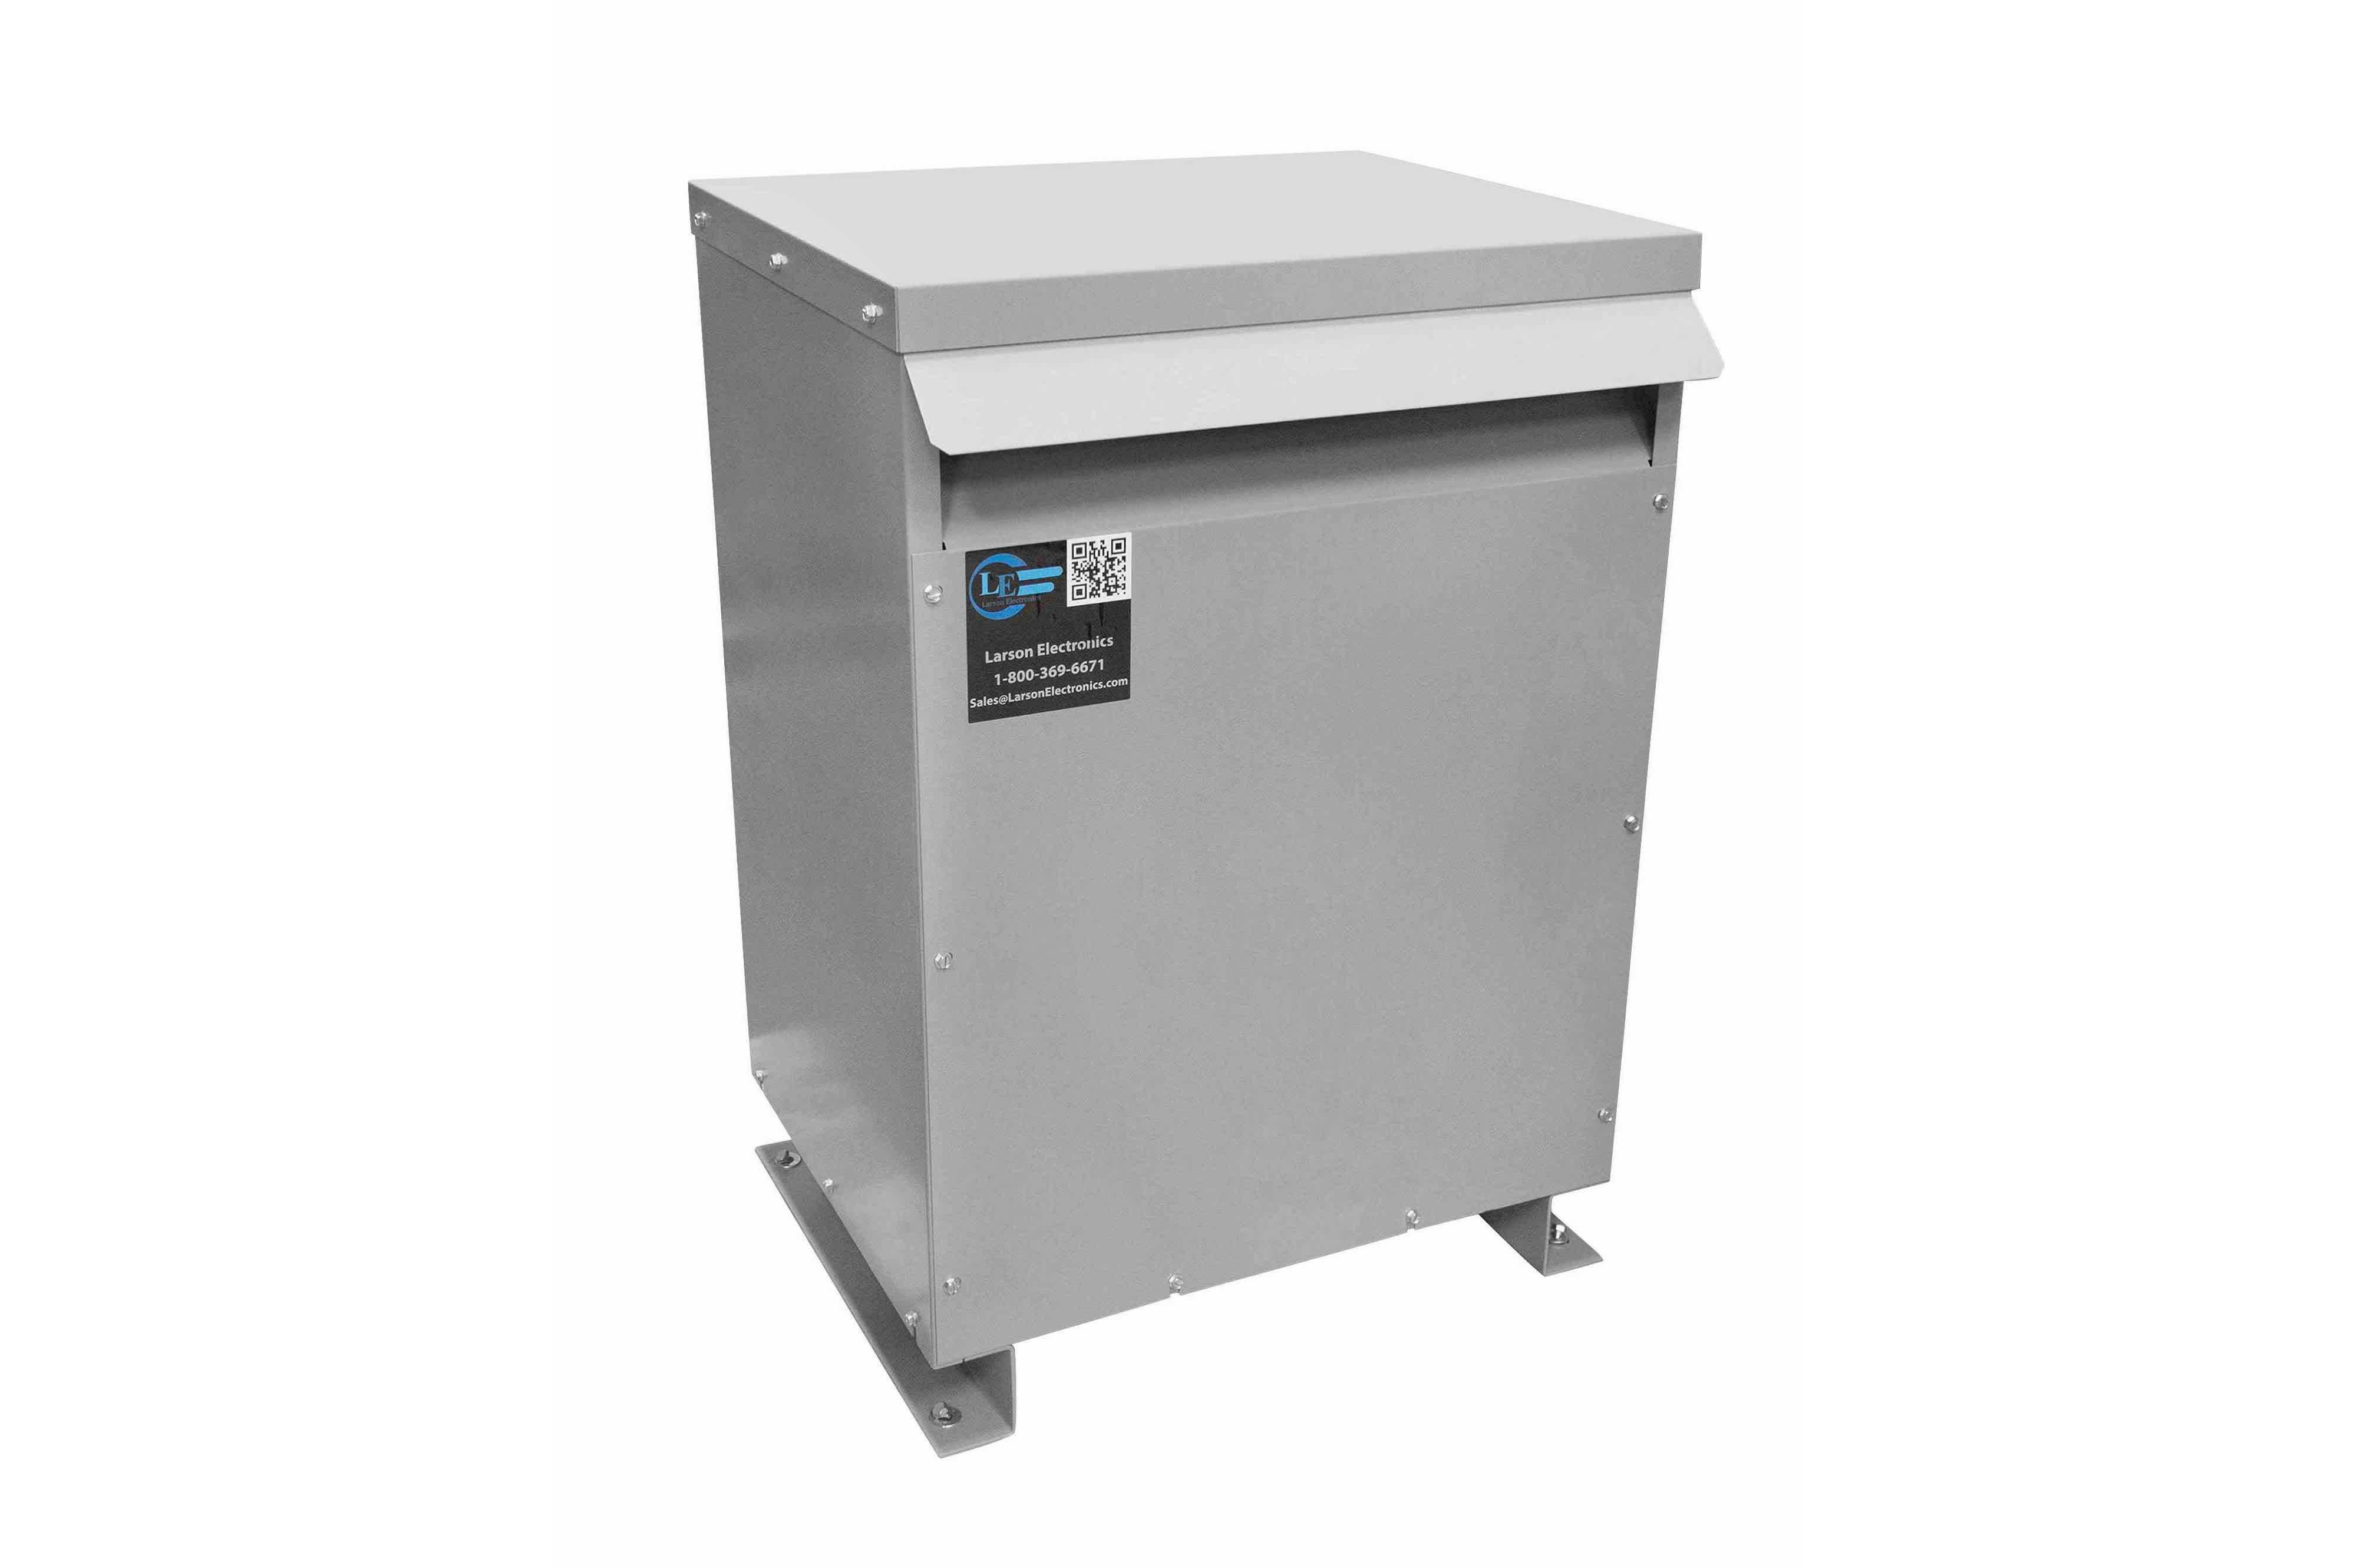 40 kVA 3PH DOE Transformer, 575V Delta Primary, 415Y/240 Wye-N Secondary, N3R, Ventilated, 60 Hz